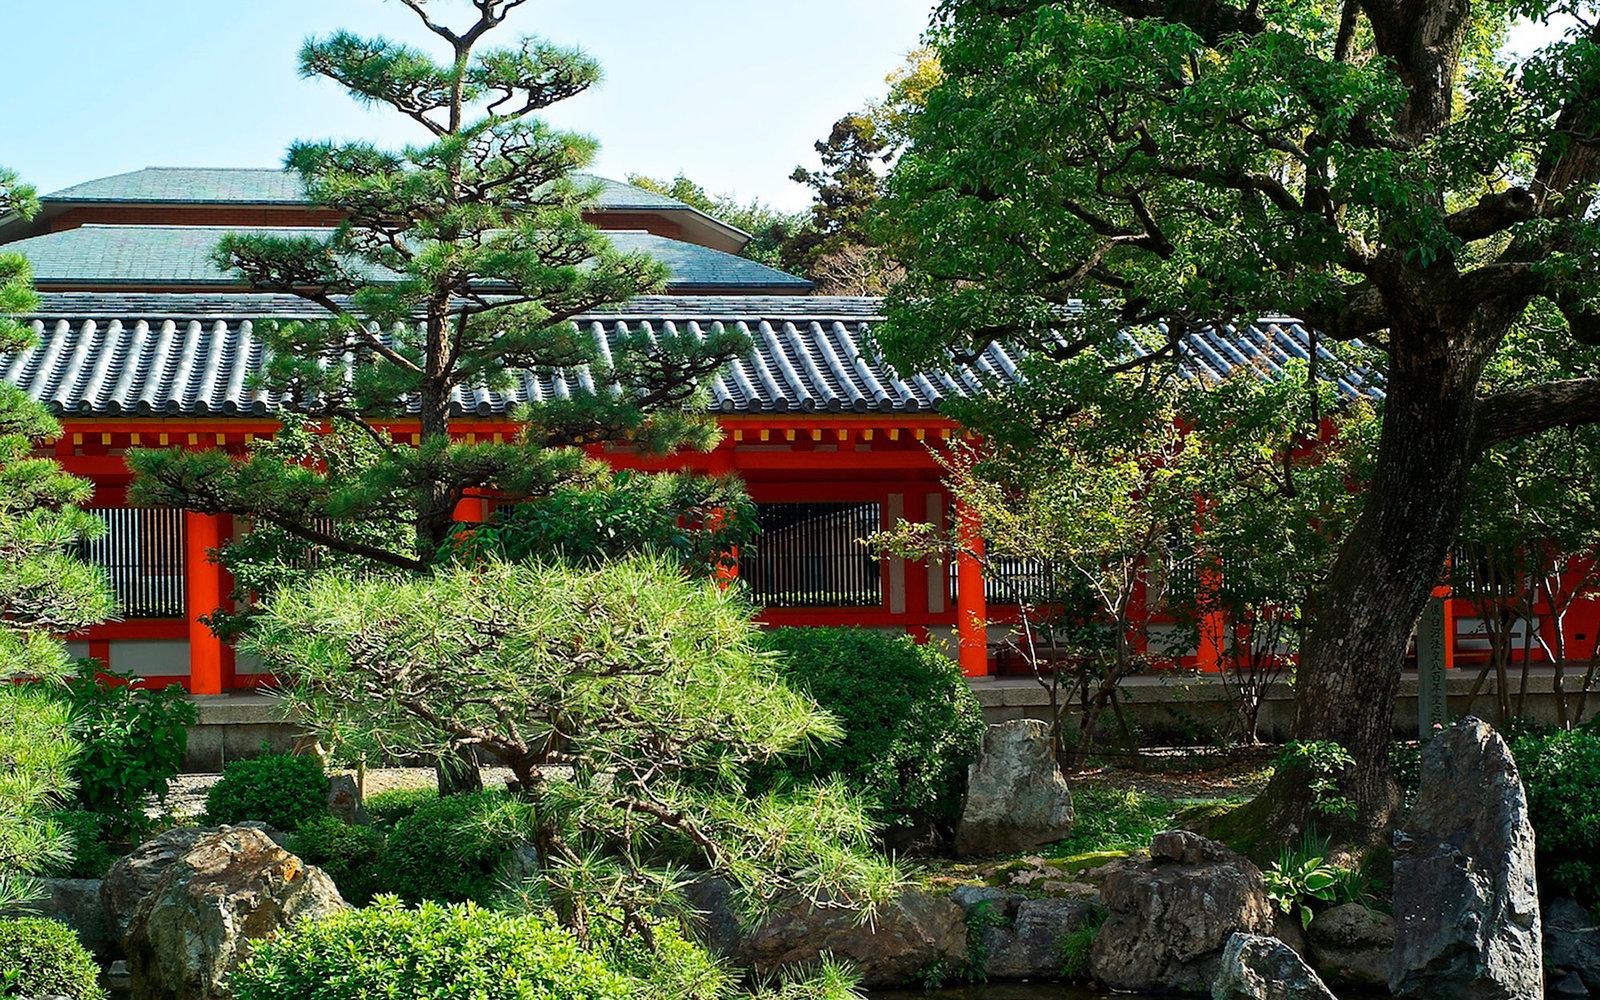 https://www.cnn.com/2016/03/31/politics/gallery/donald-trump-quotes Zen Garden Designs Back Ya Html on